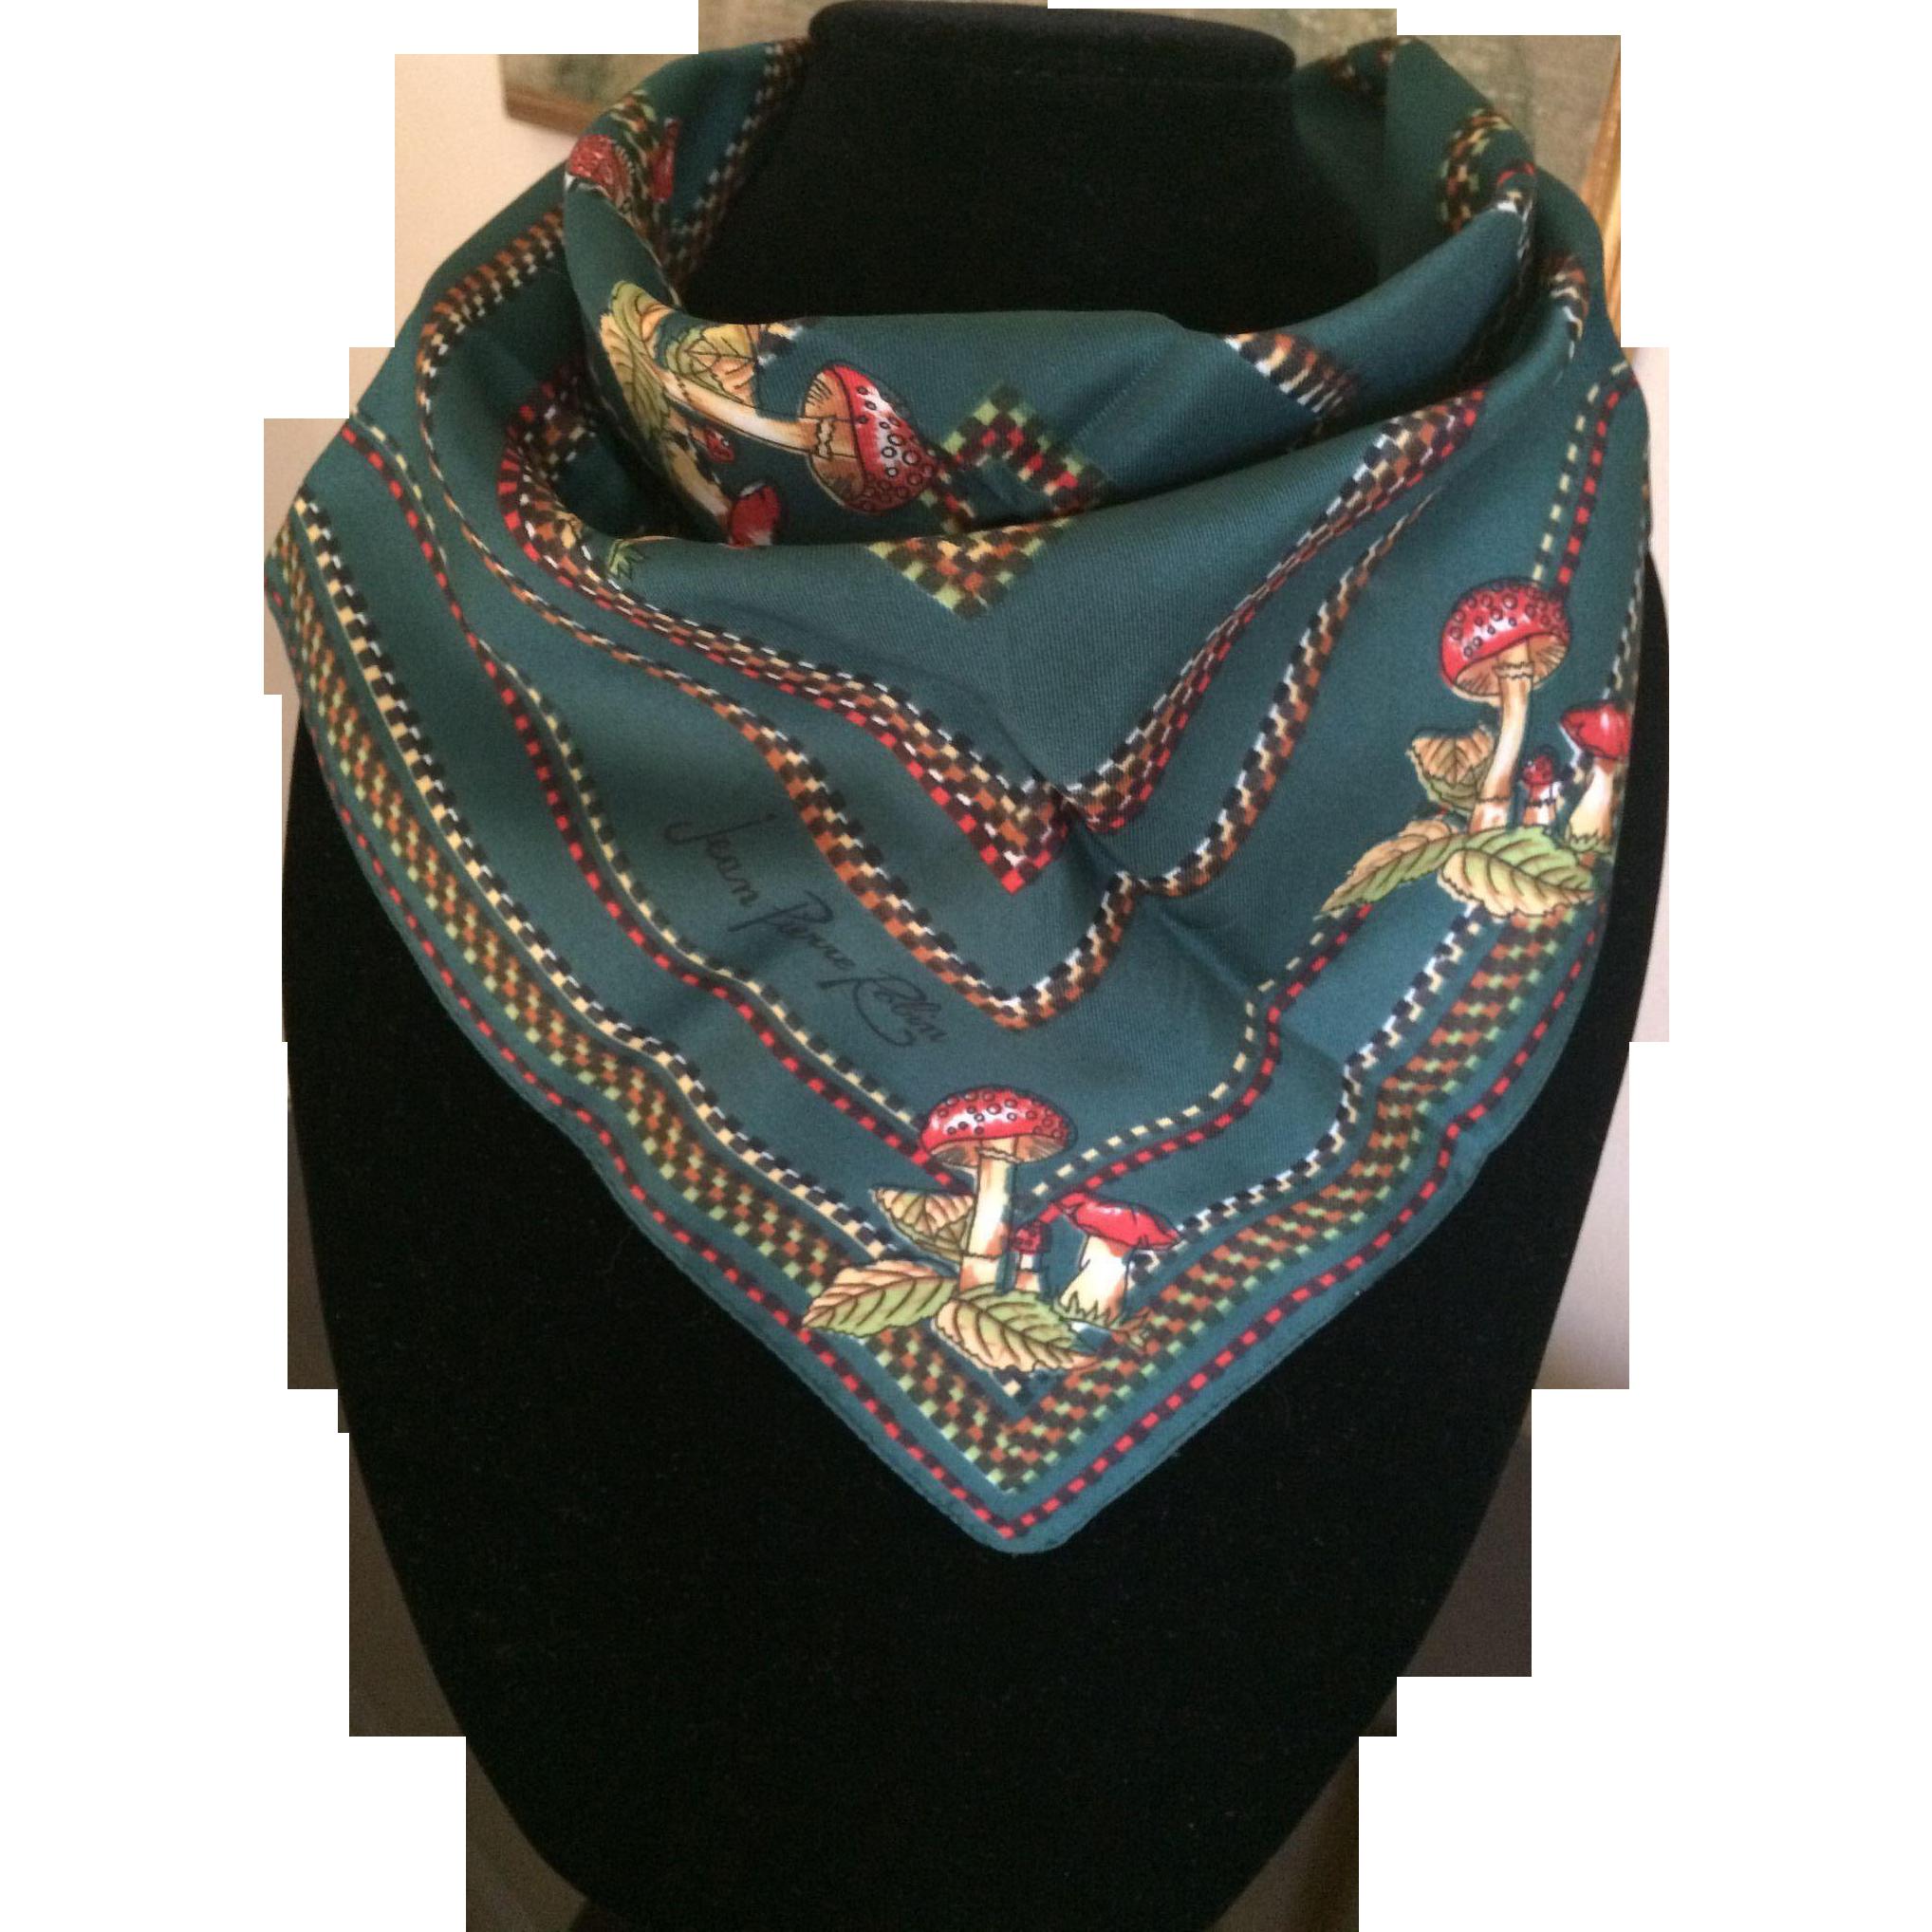 Vintage Jean Pierre Robin magic mushroom scarf